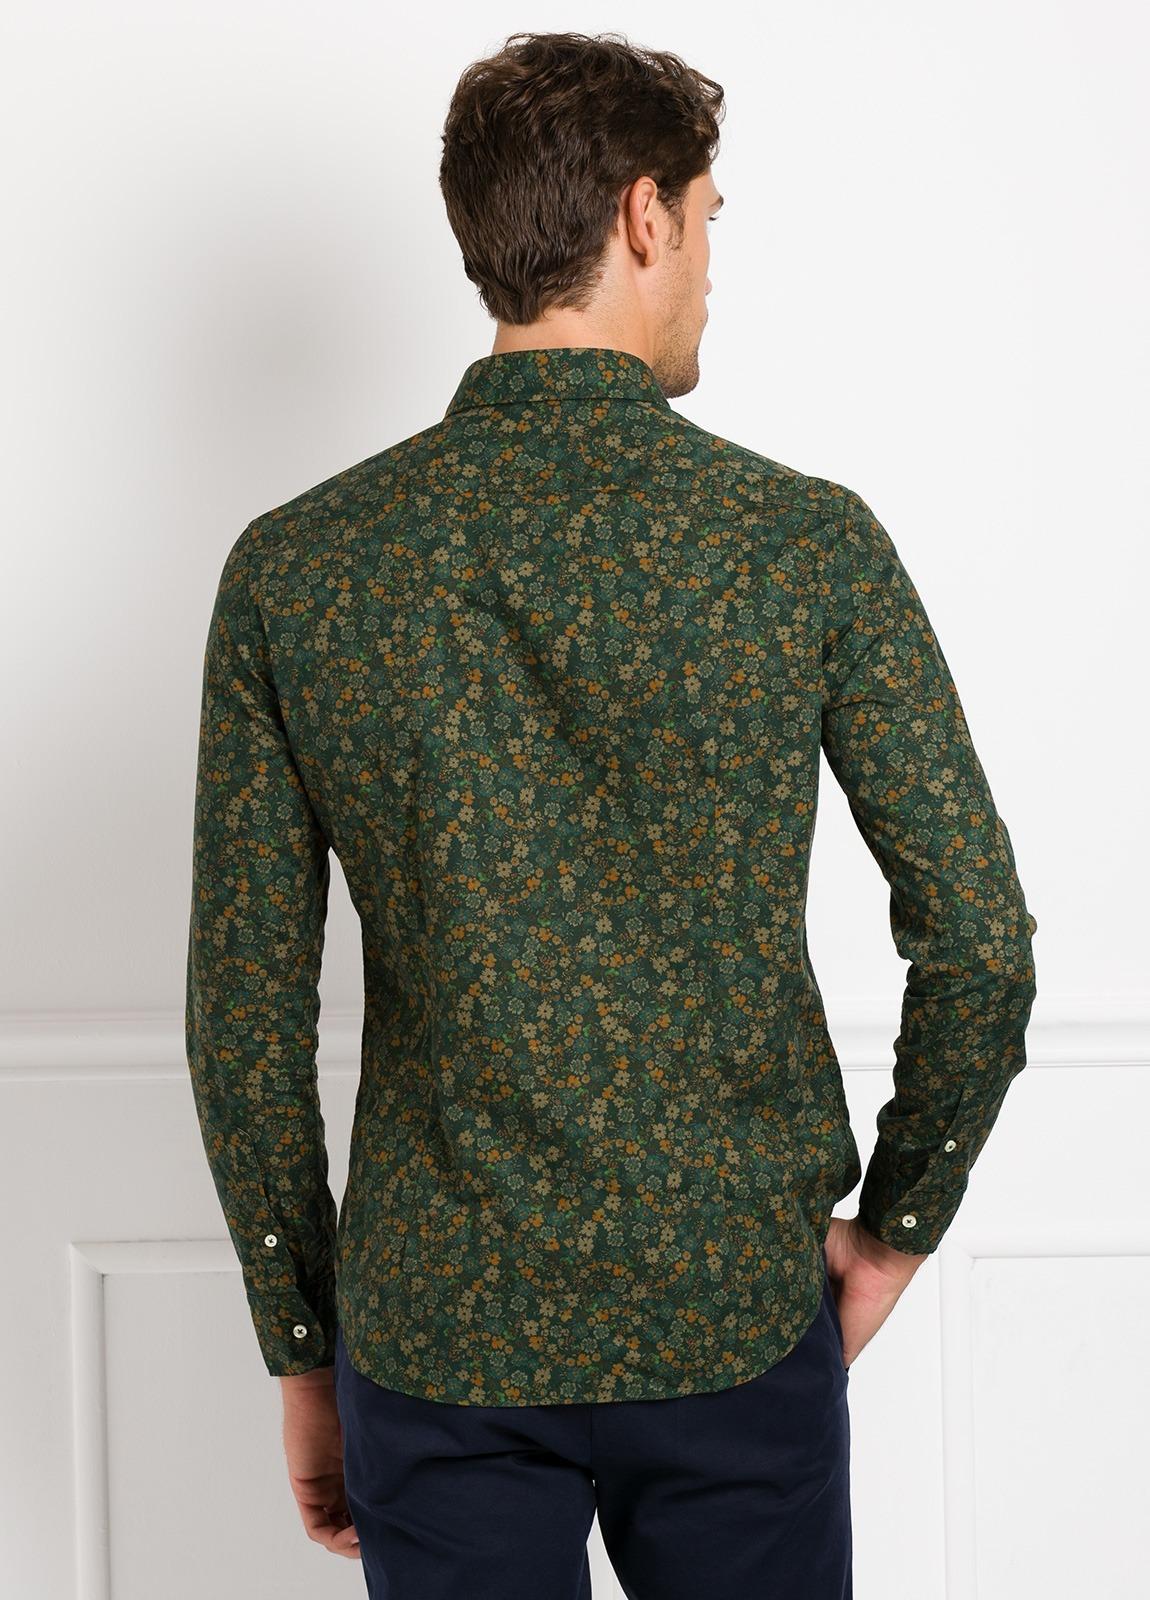 Camisa Leisure Wear SLIM FIT modelo PORTO estampado flores color verde. 100% Algodón. - Ítem3